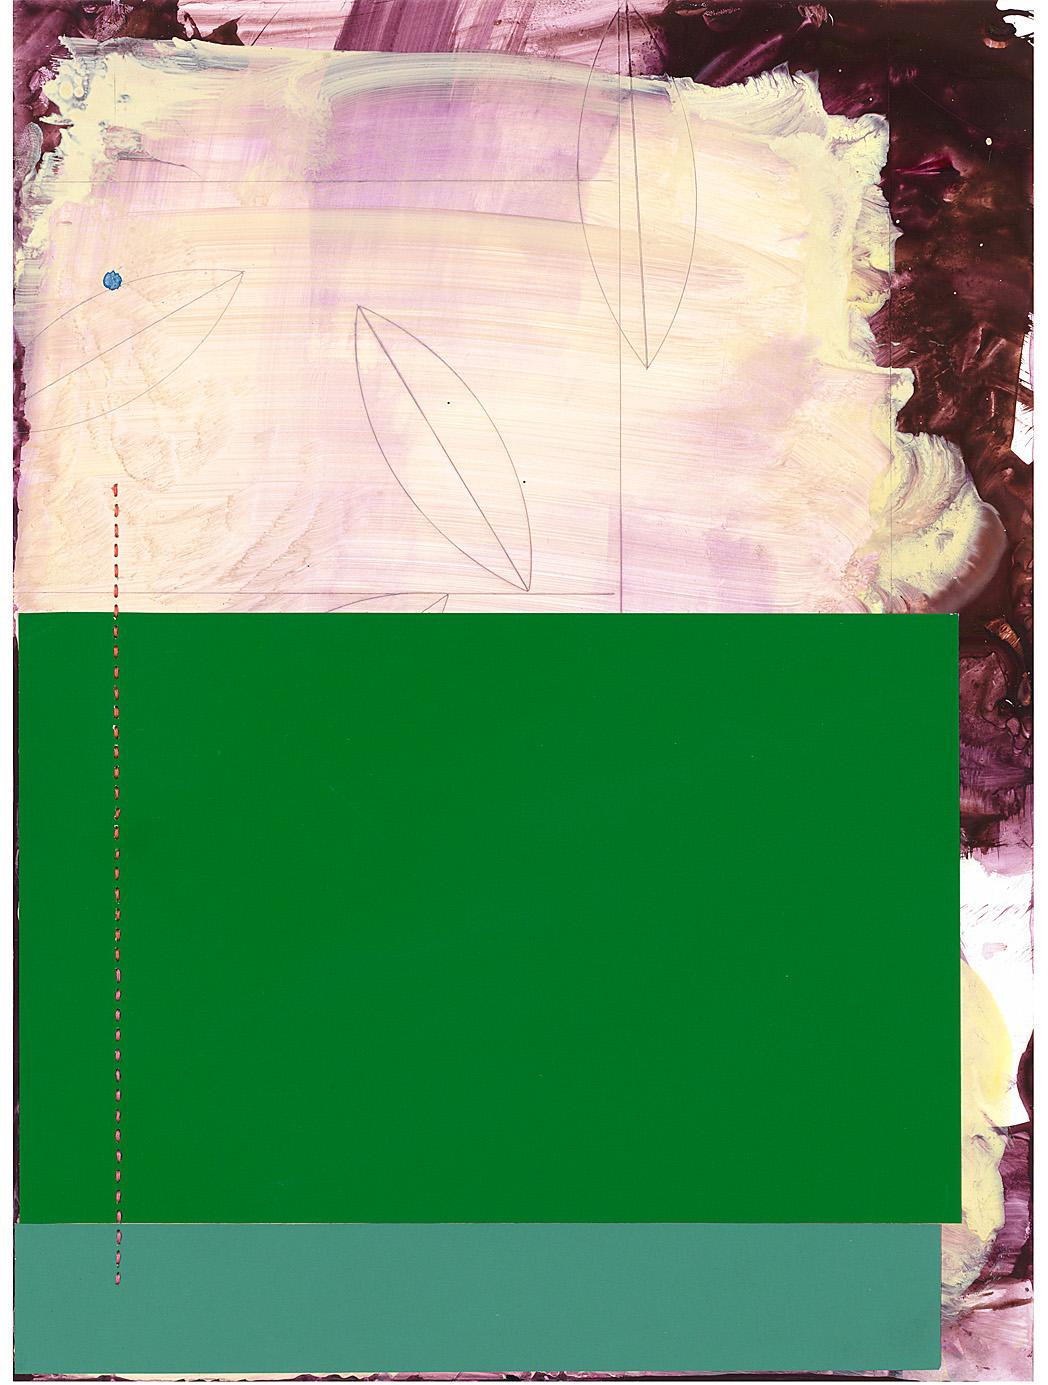 o.T. paperwork, 34 x 25 cm